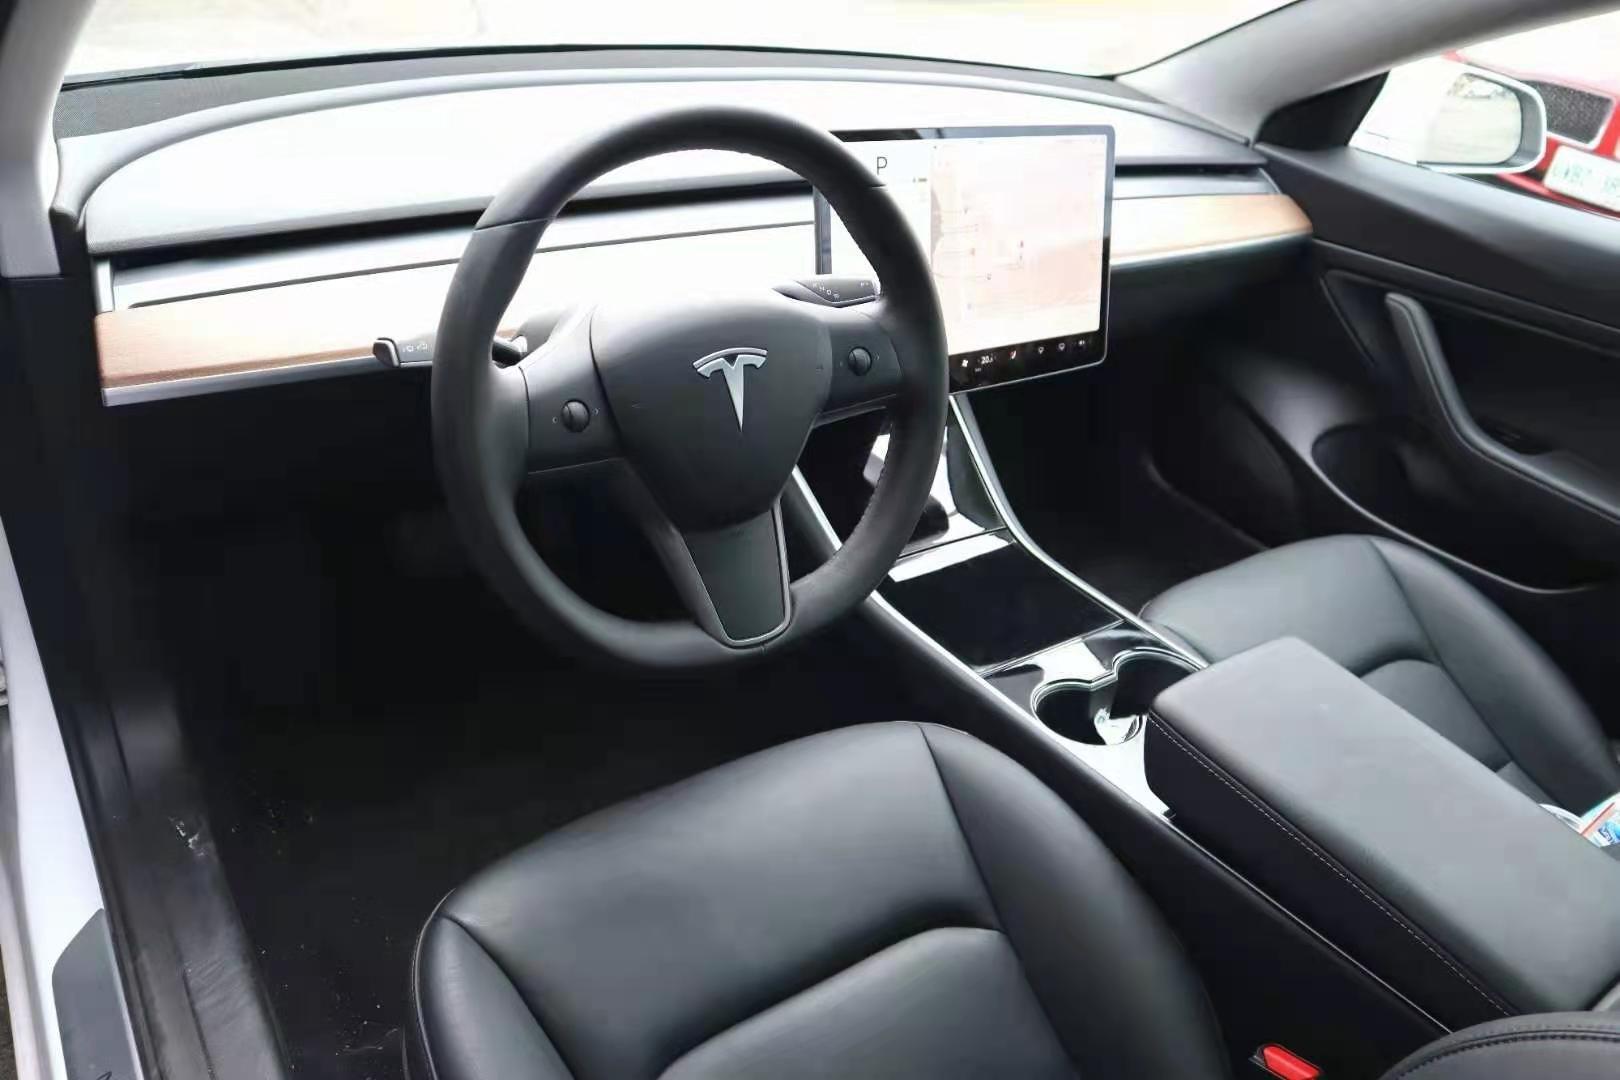 2019 Tesla Model 3 MODEL 3 - INFOCAR - Toronto's Most Comprehensive New and Used Auto Trading Platform